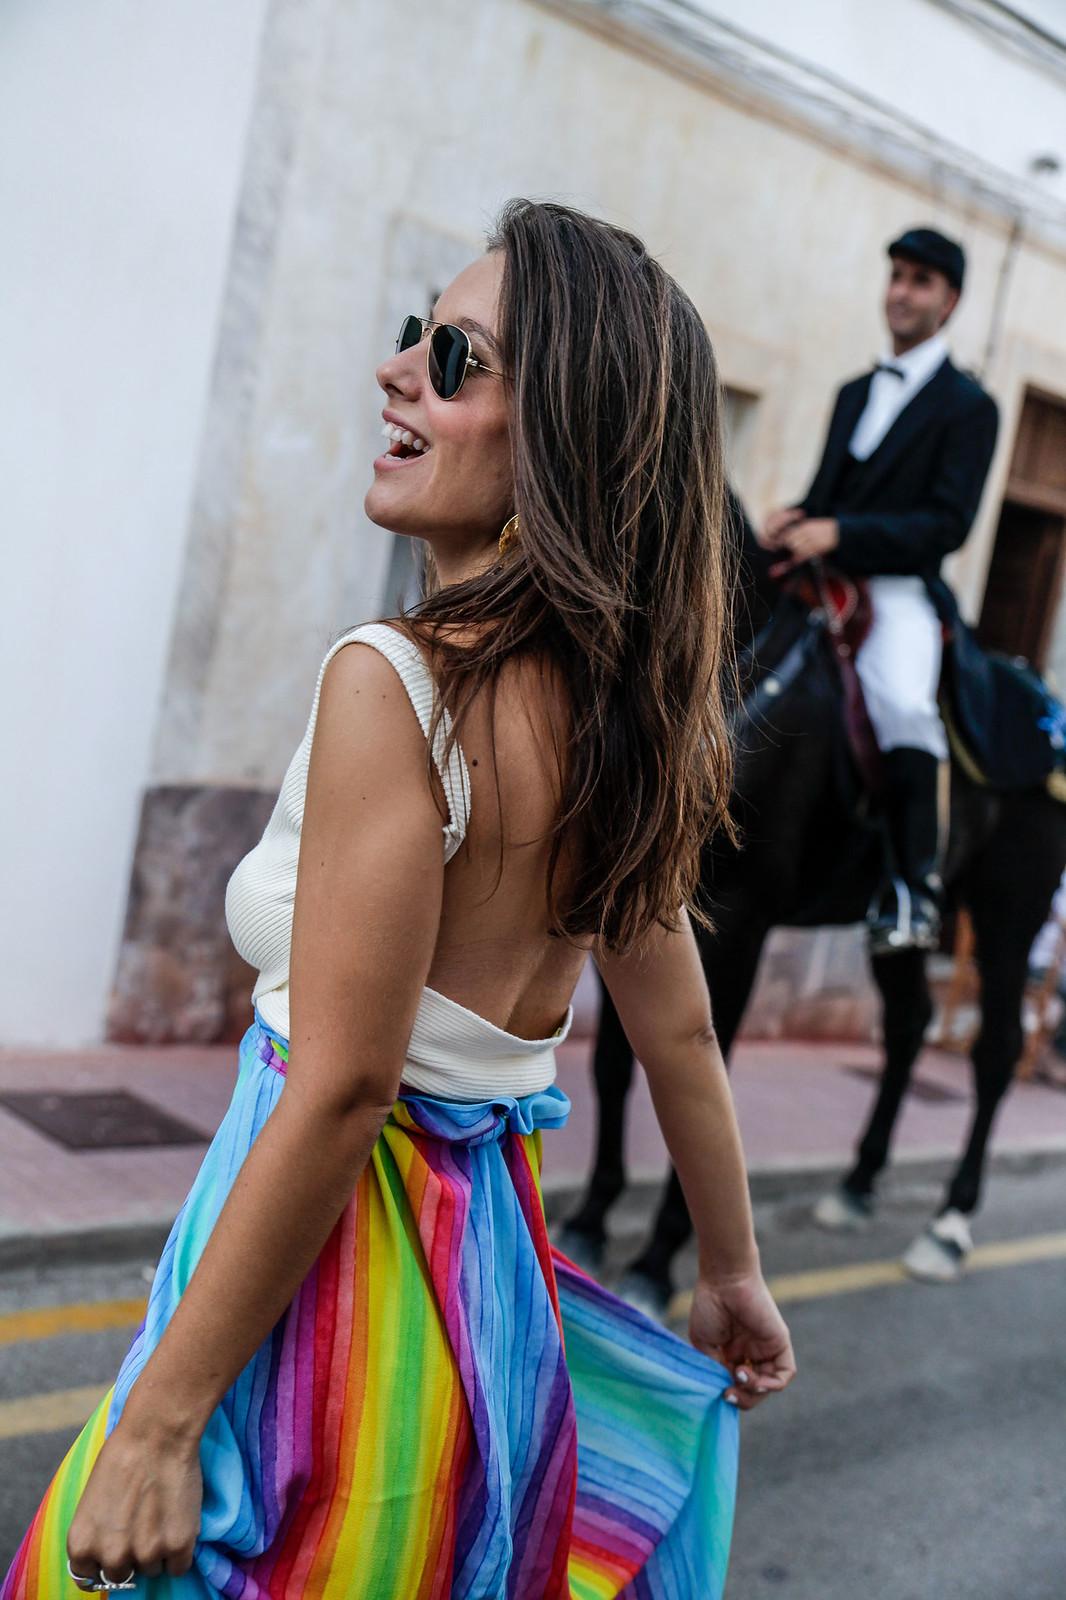 03_falda_arcoiris_top_crudo_look_fiestas_menorca_verano_theguestgirl_fashion_blogger_minorca_summer_laura_santolaria_rayban_sunglasses